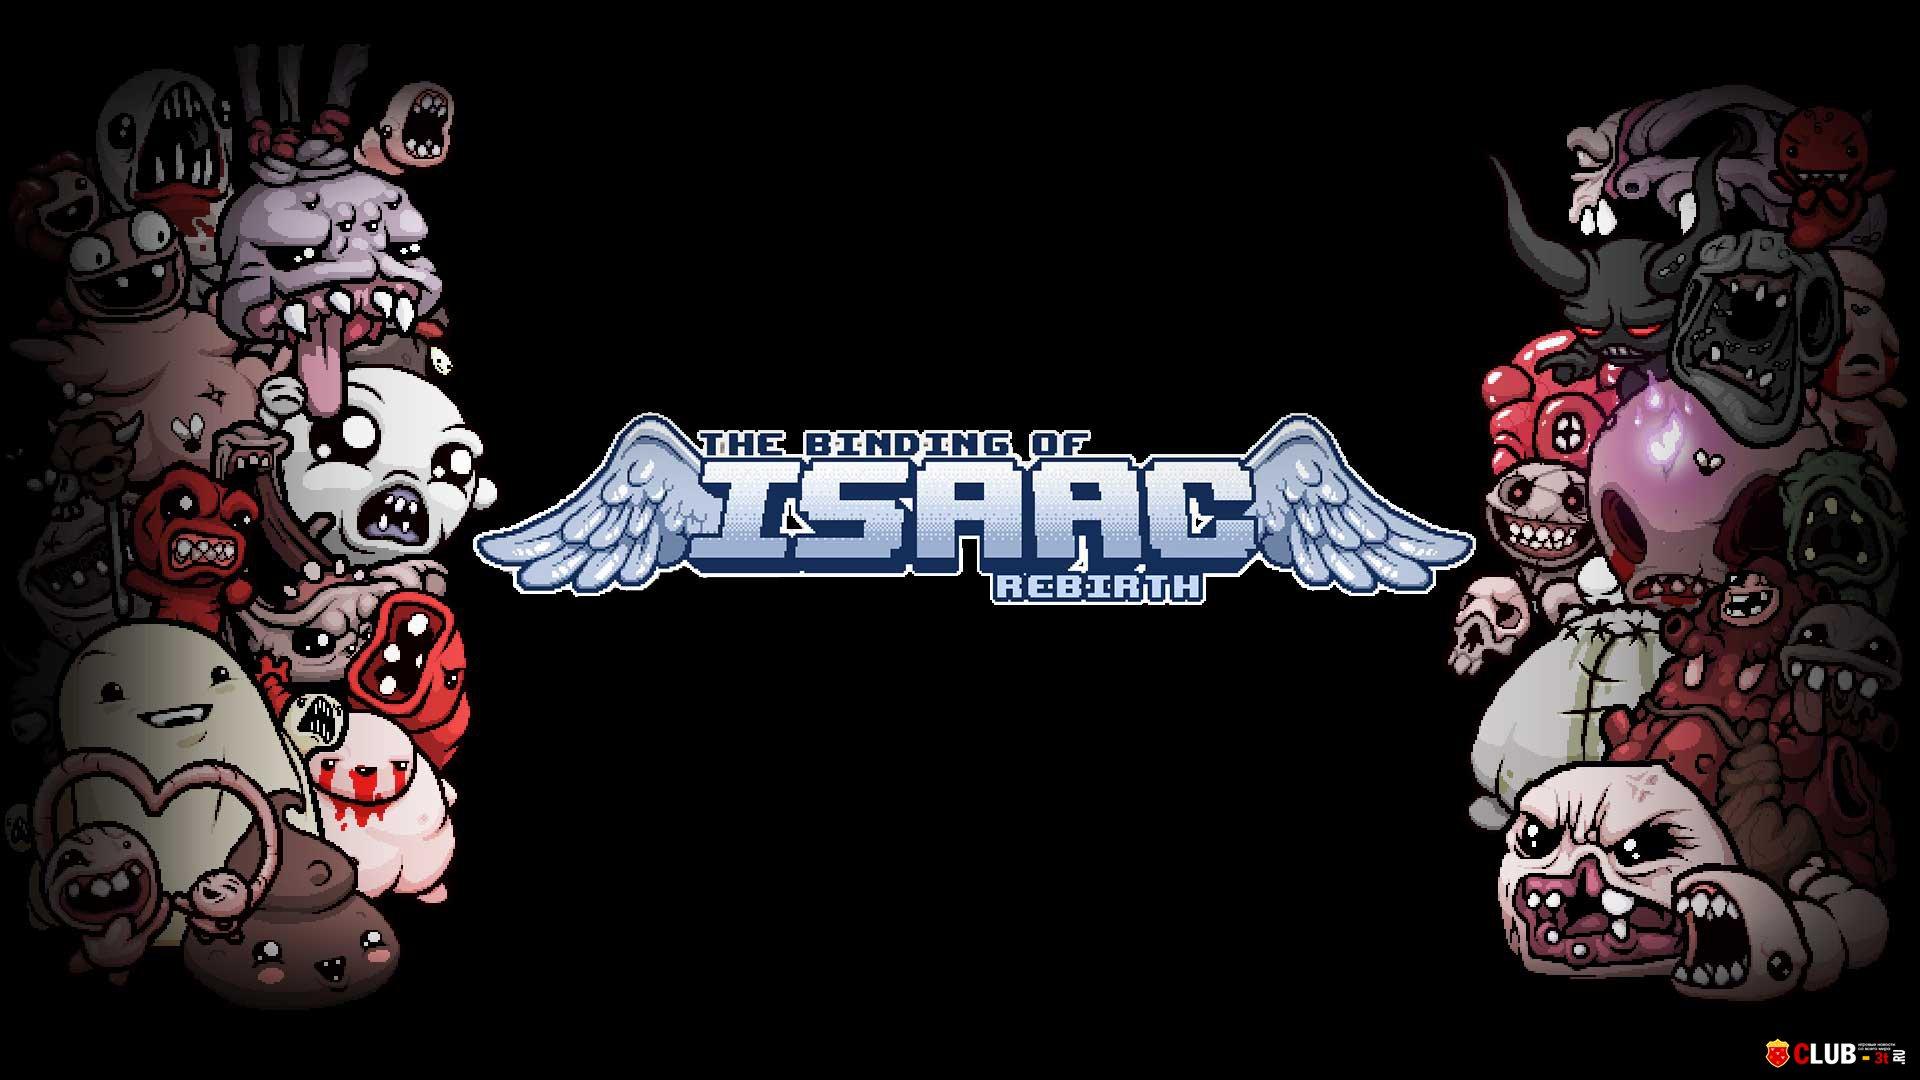 Isaac cheat sheet platinum god binding of isaac rebirth cheat sheet